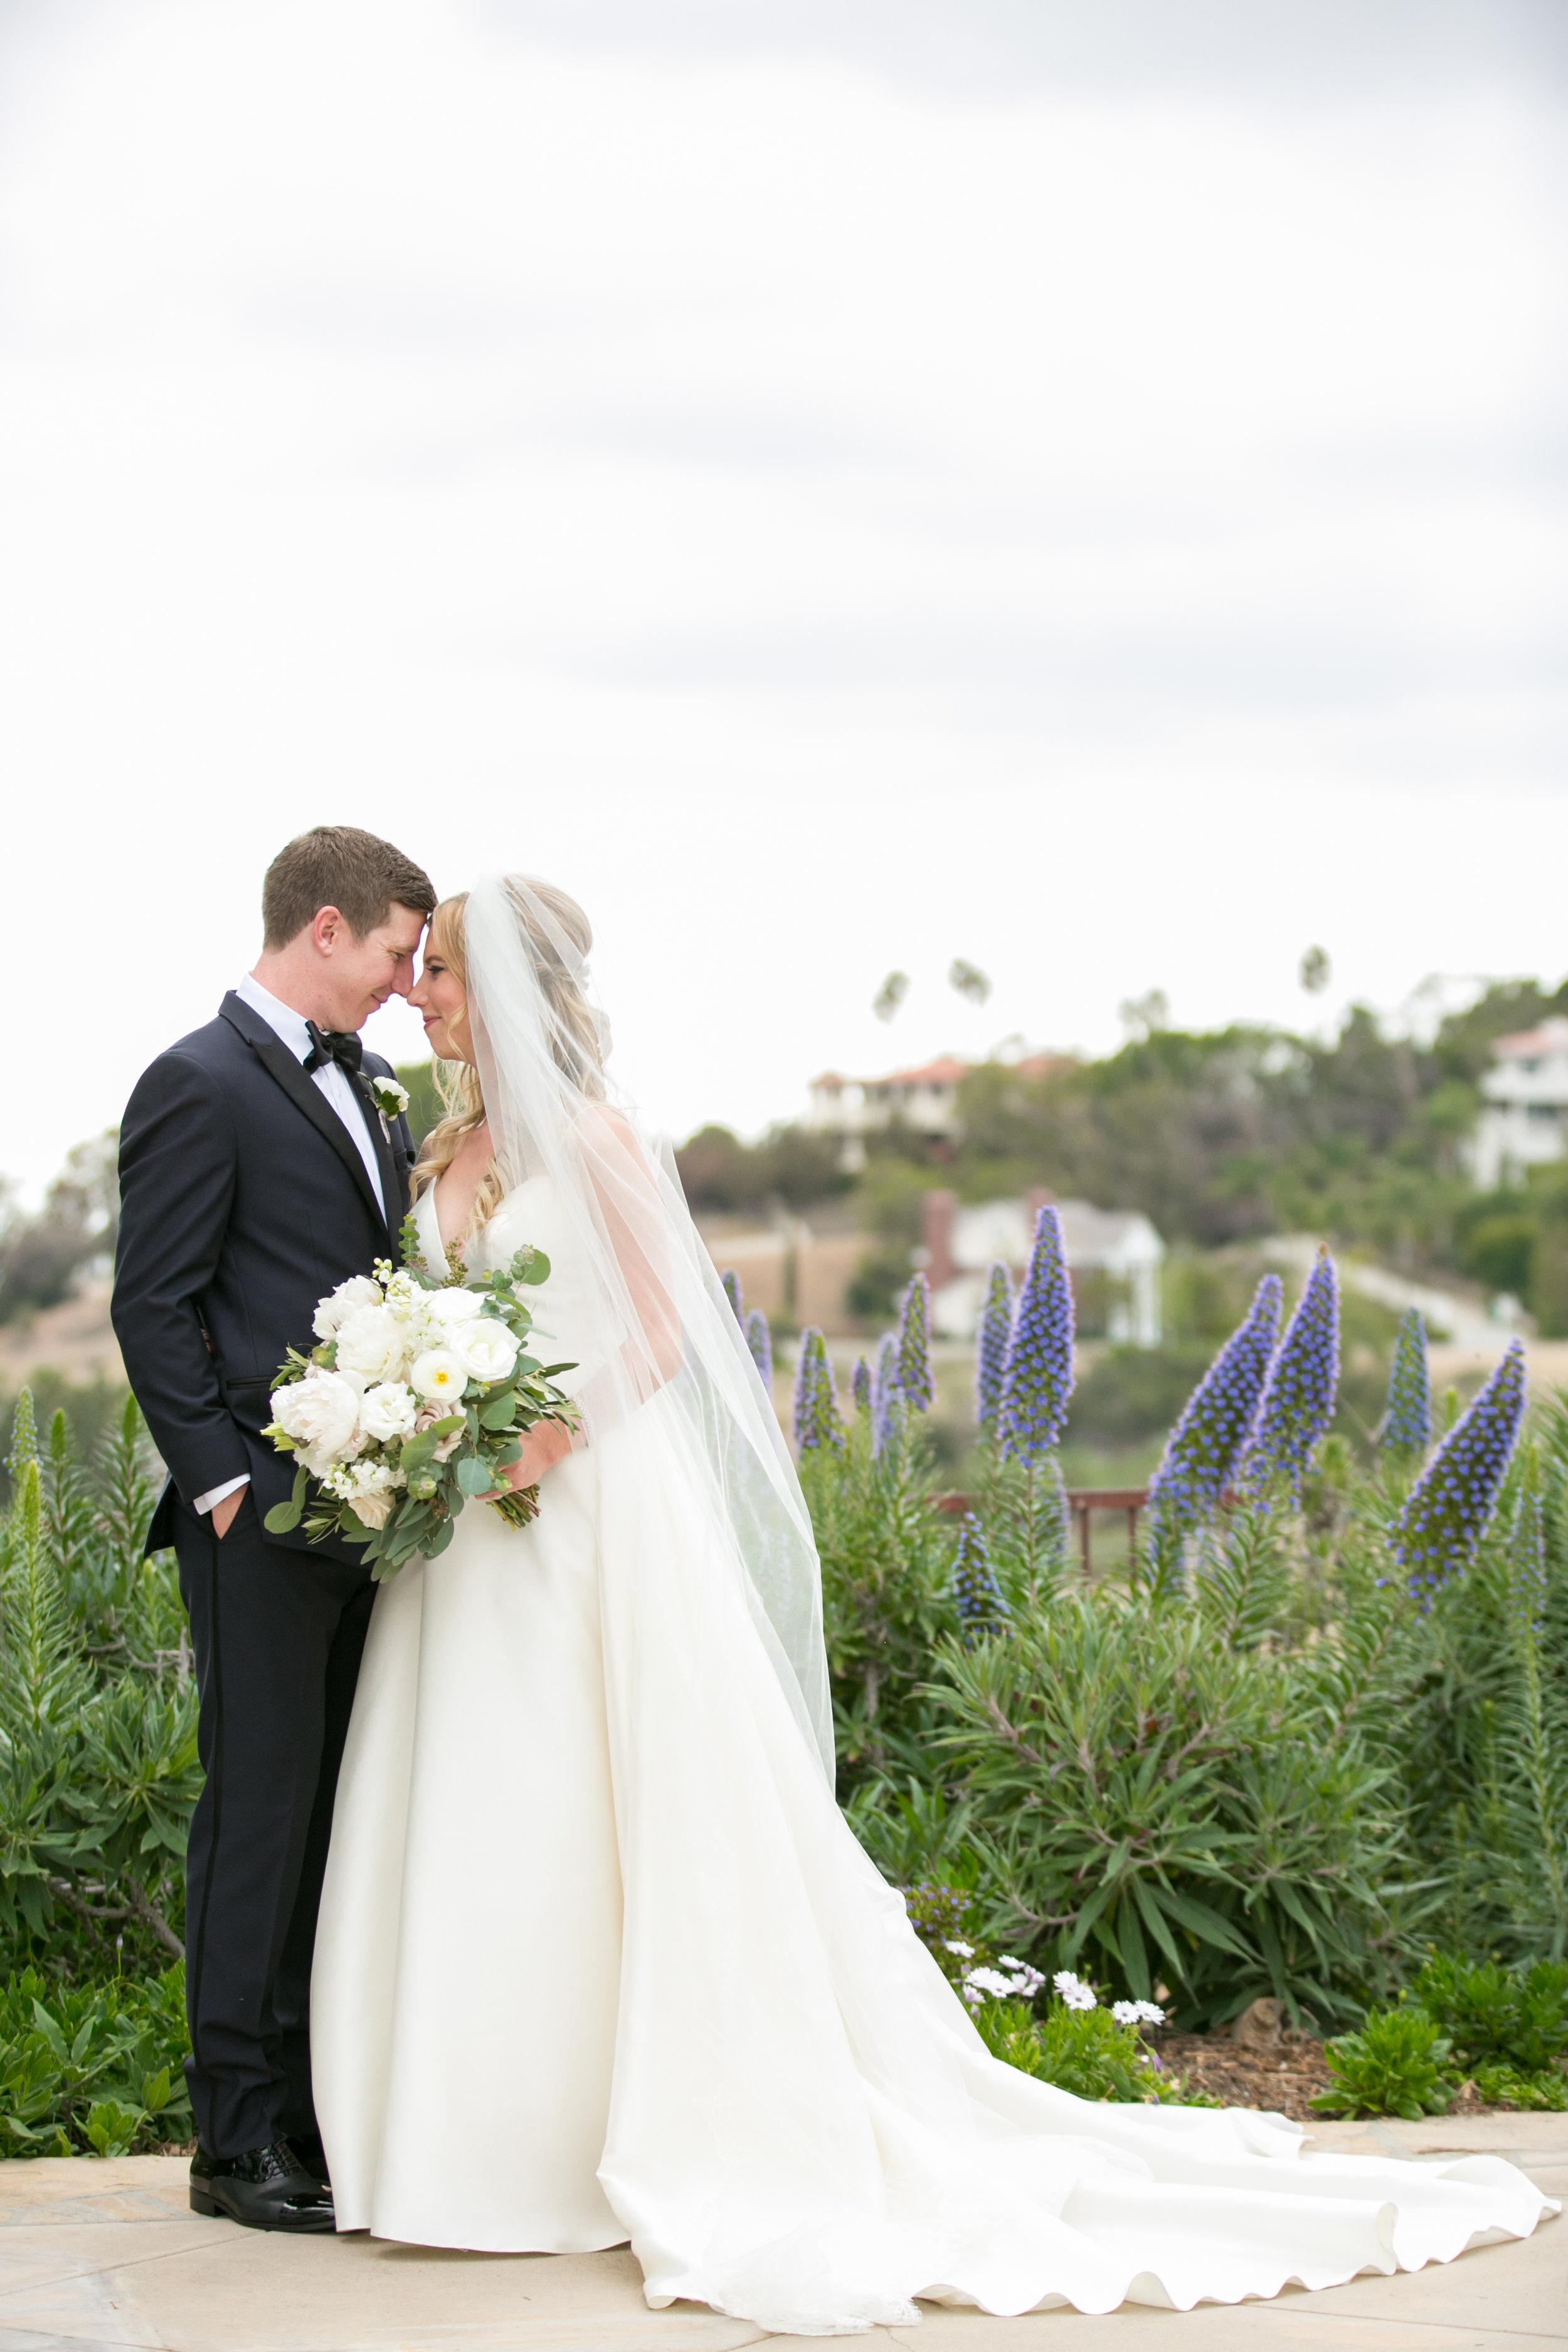 Jaosn Snorlax Photography Kyle & Jacqueline Wedding-78.jpg